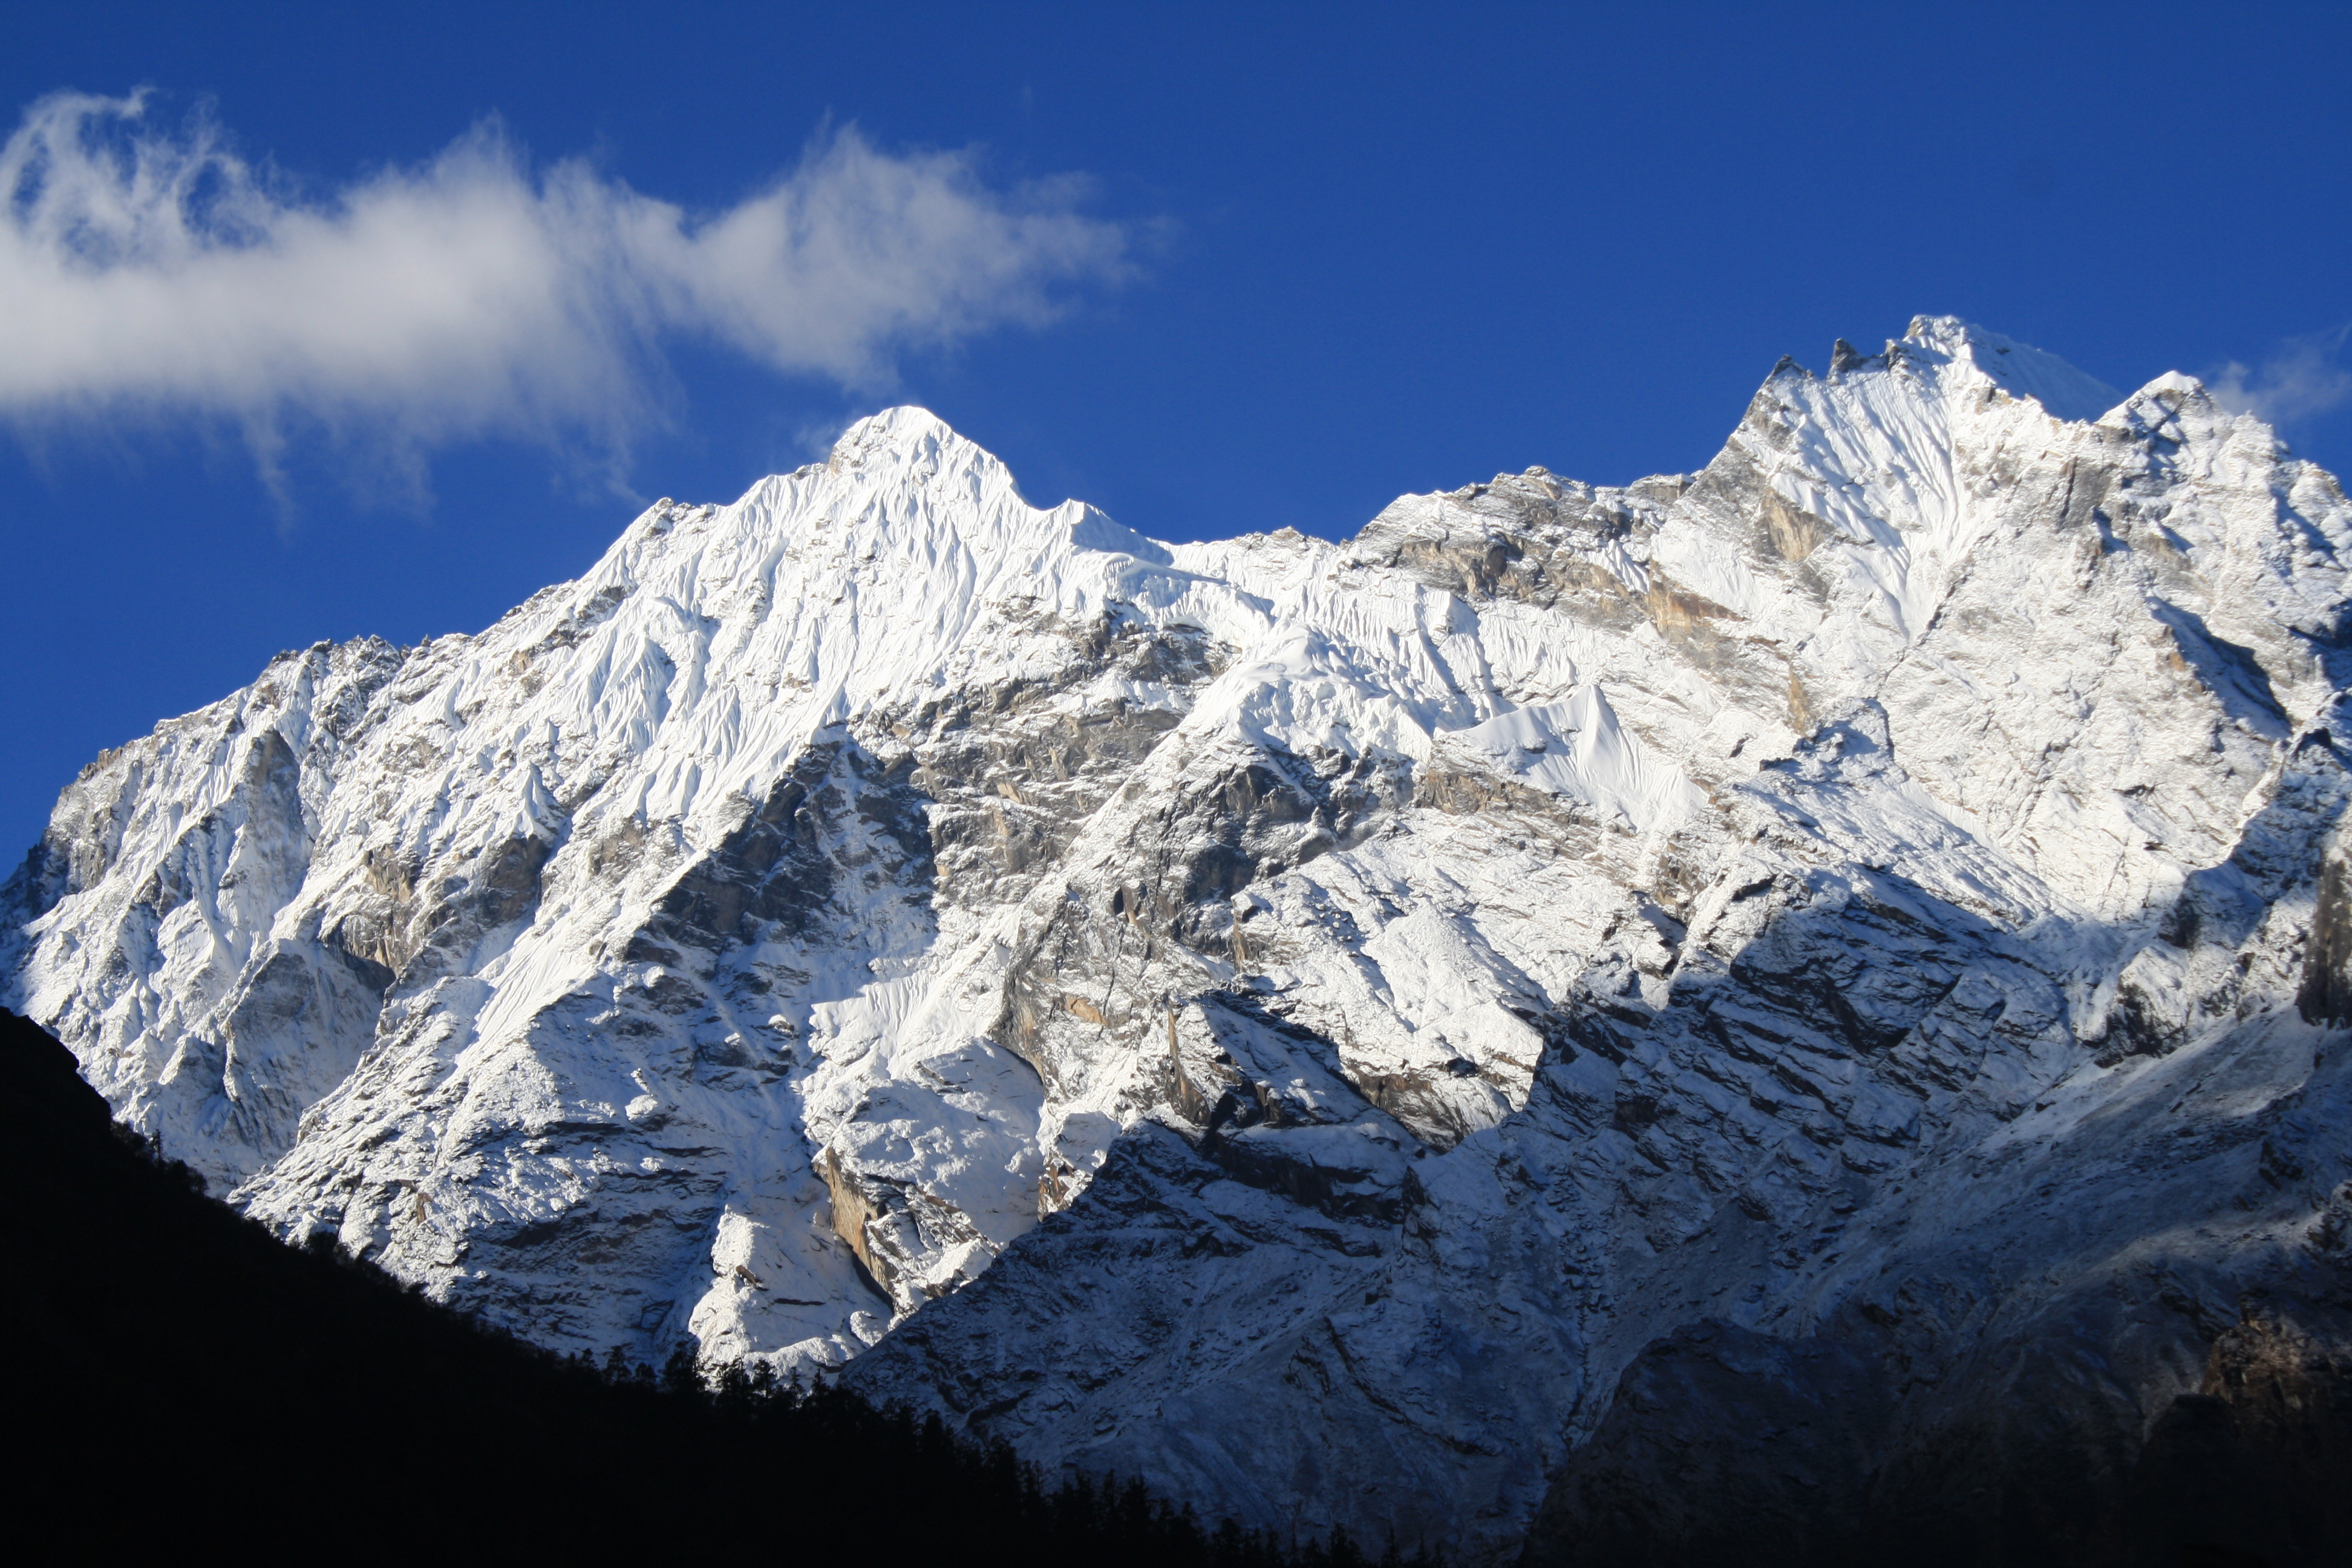 http://192.168.0.204/discoverhimalayan/wp-content/uploads/2017/09/Ganesh-Himal-Trek-discoverhimalayantrek.jpg